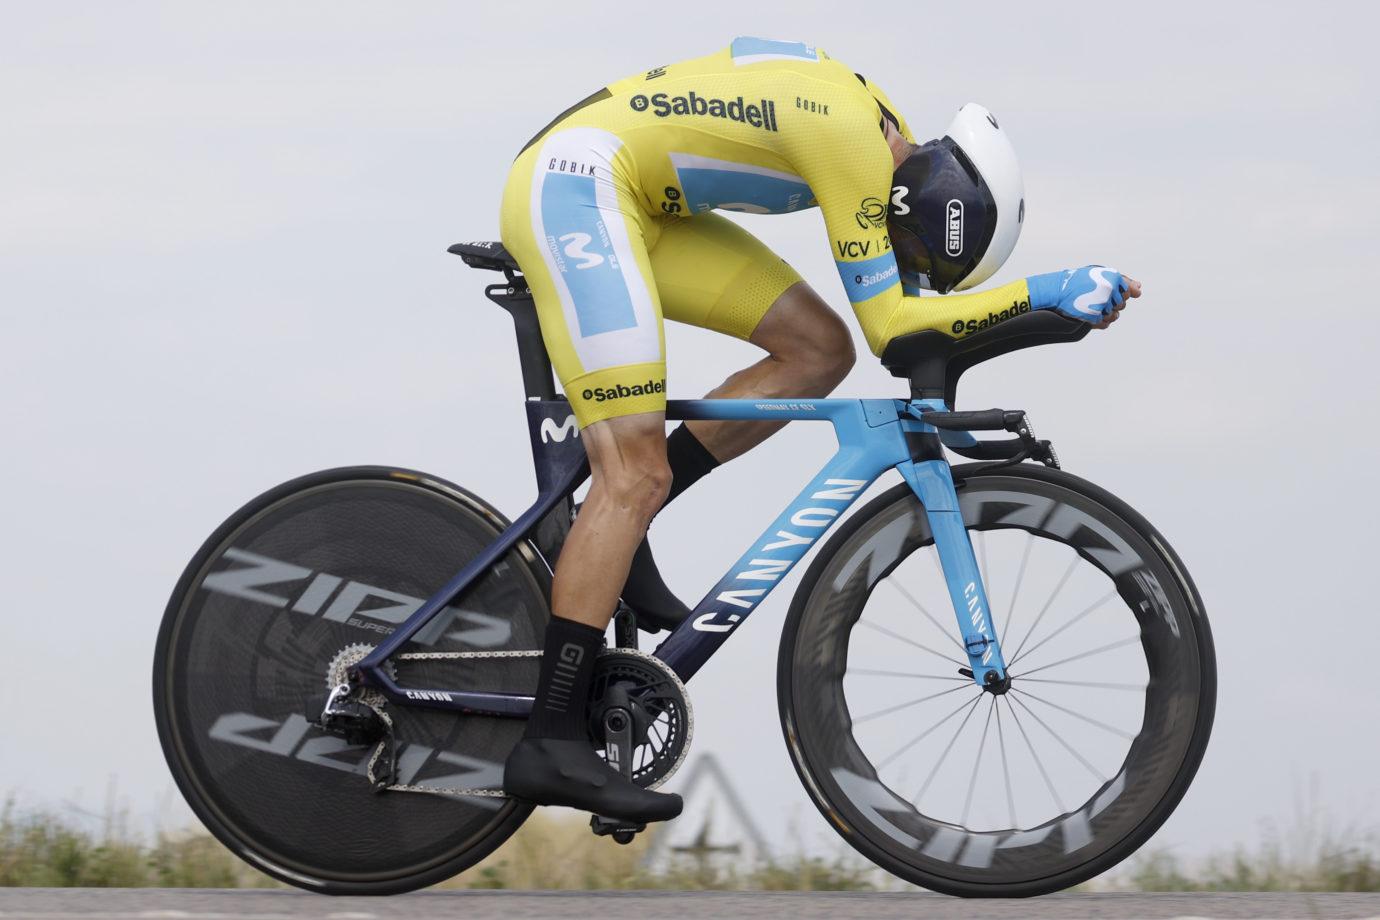 Imagen de la noticia 'Puncture erases Enric Mas' GC chance at Vuelta CV TT'